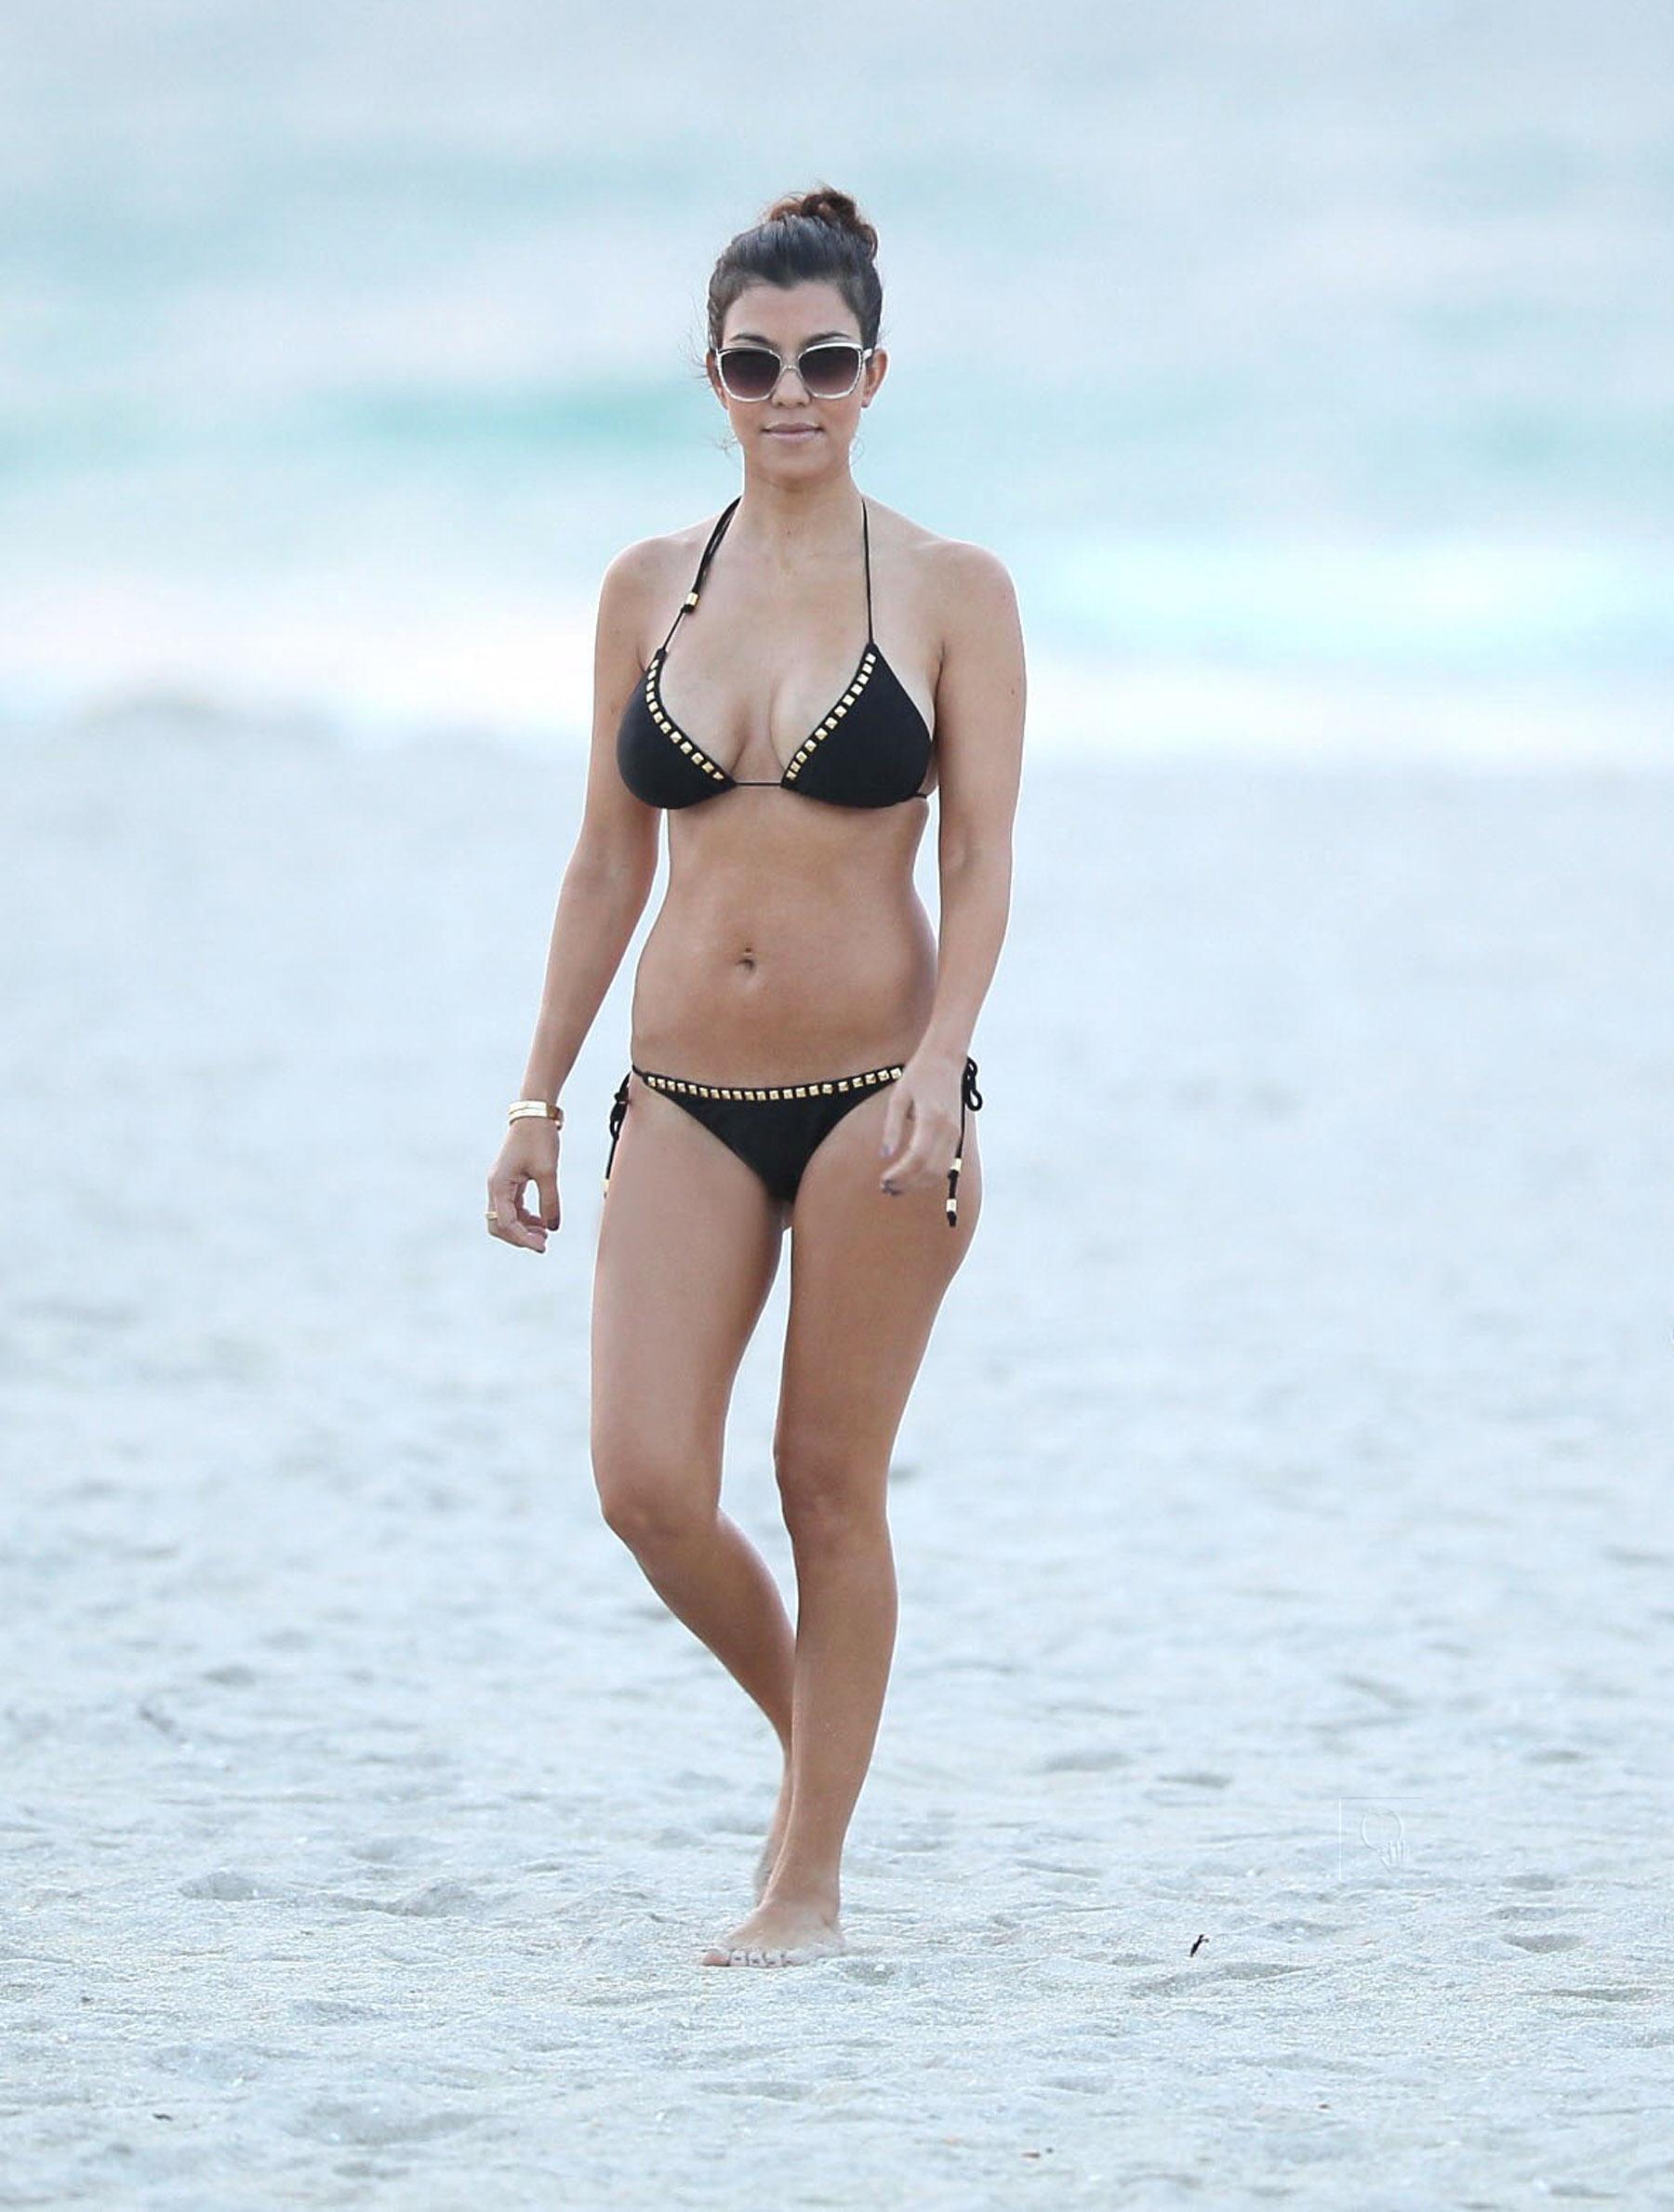 02040_Kourtney_Kardashian_at_Miami_Beach5_122_499lo.jpg